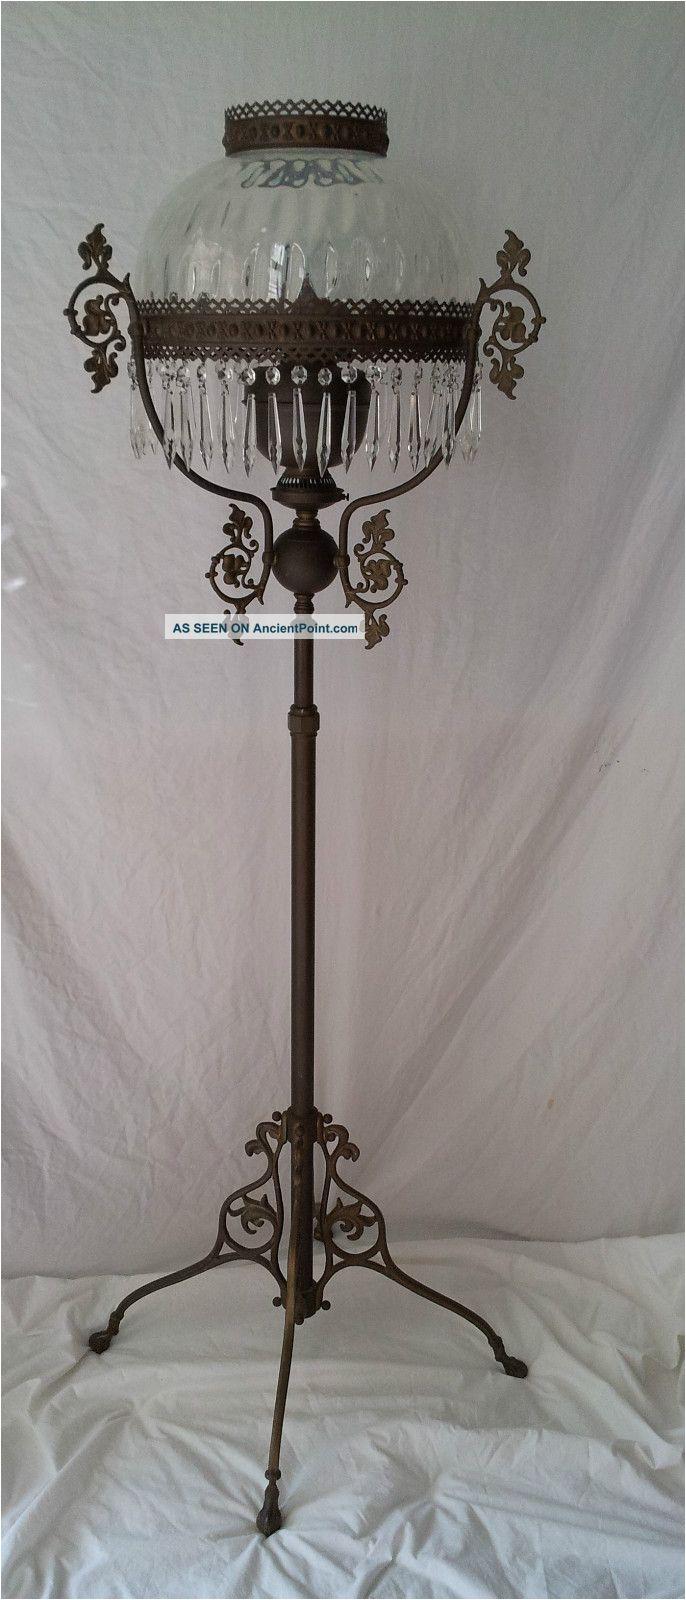 Antique Brass Floor Lamps Value Antique Victorian Style Kerosene Oil Floor Lamp Brass John